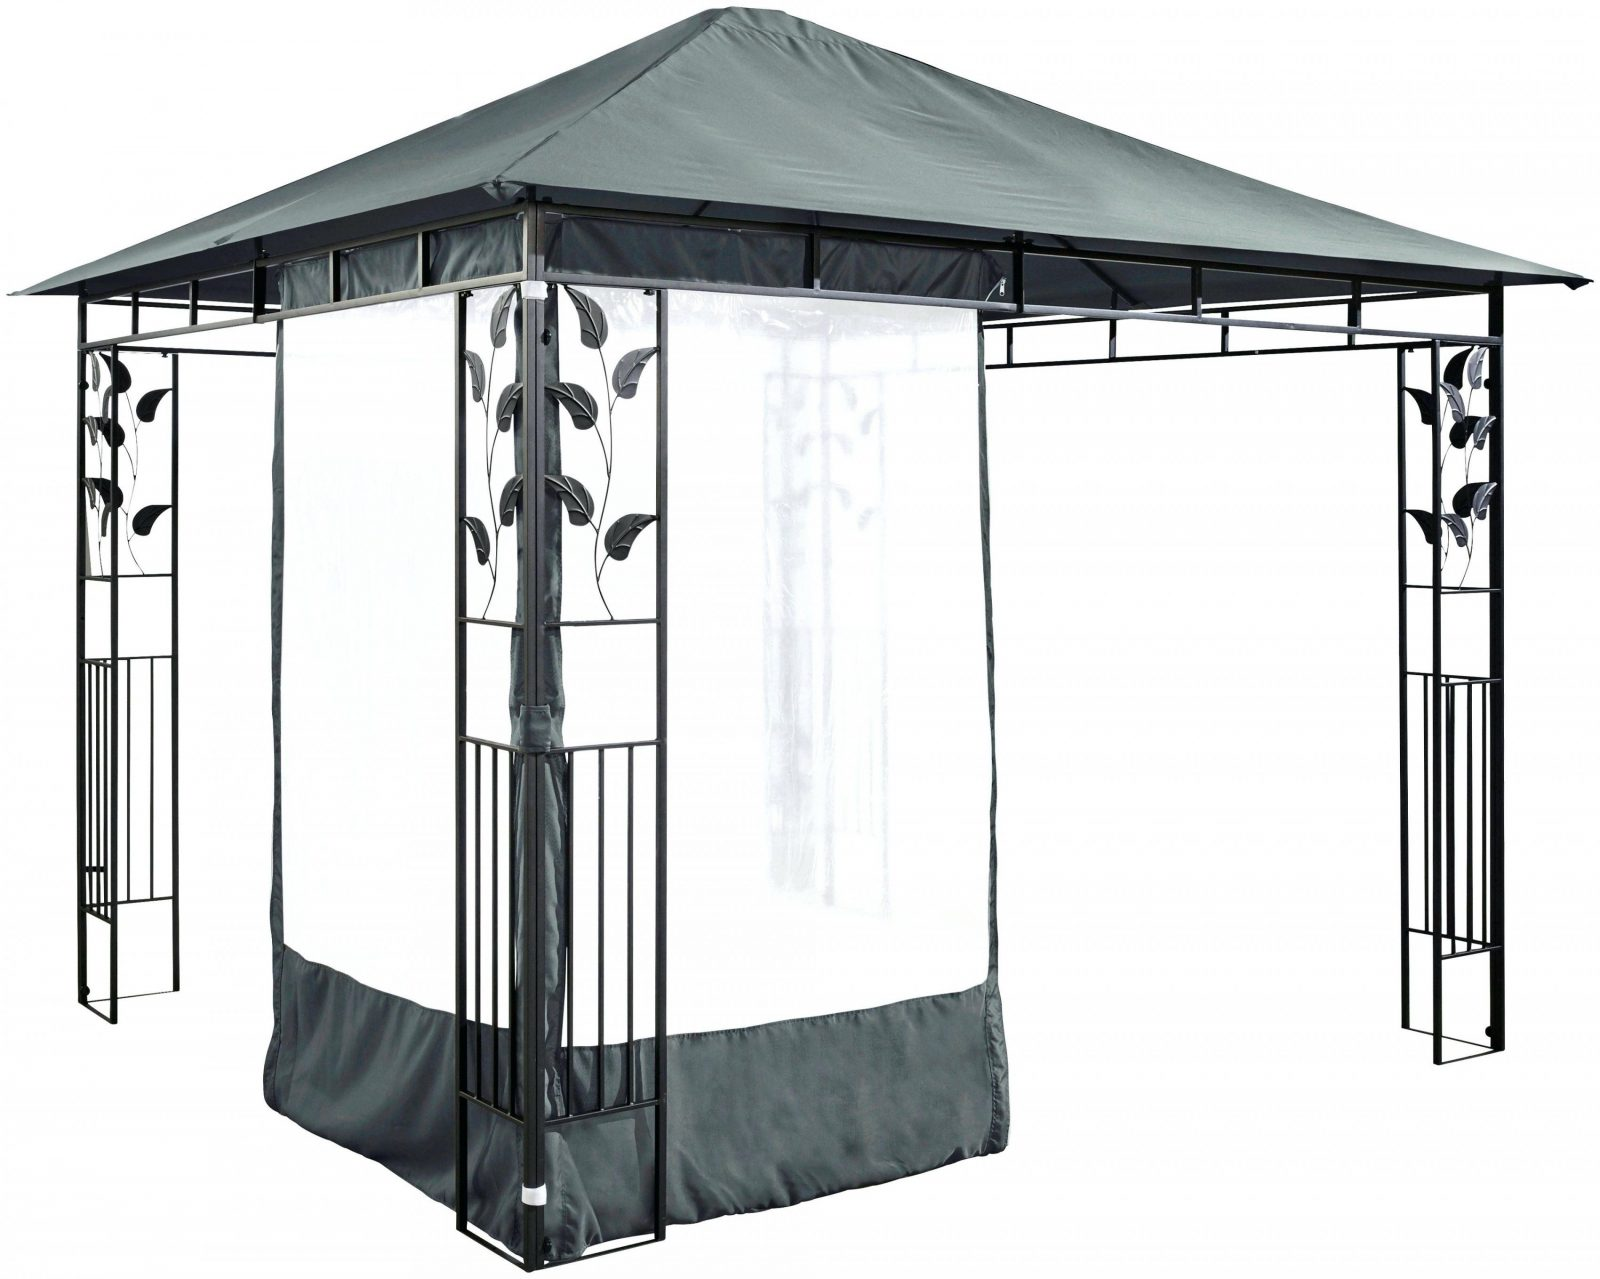 19 Bilder Pavillon Dach 3X4 Wasserdicht  Litebook von Pavillon Dach 3X4 Wasserdicht Bild